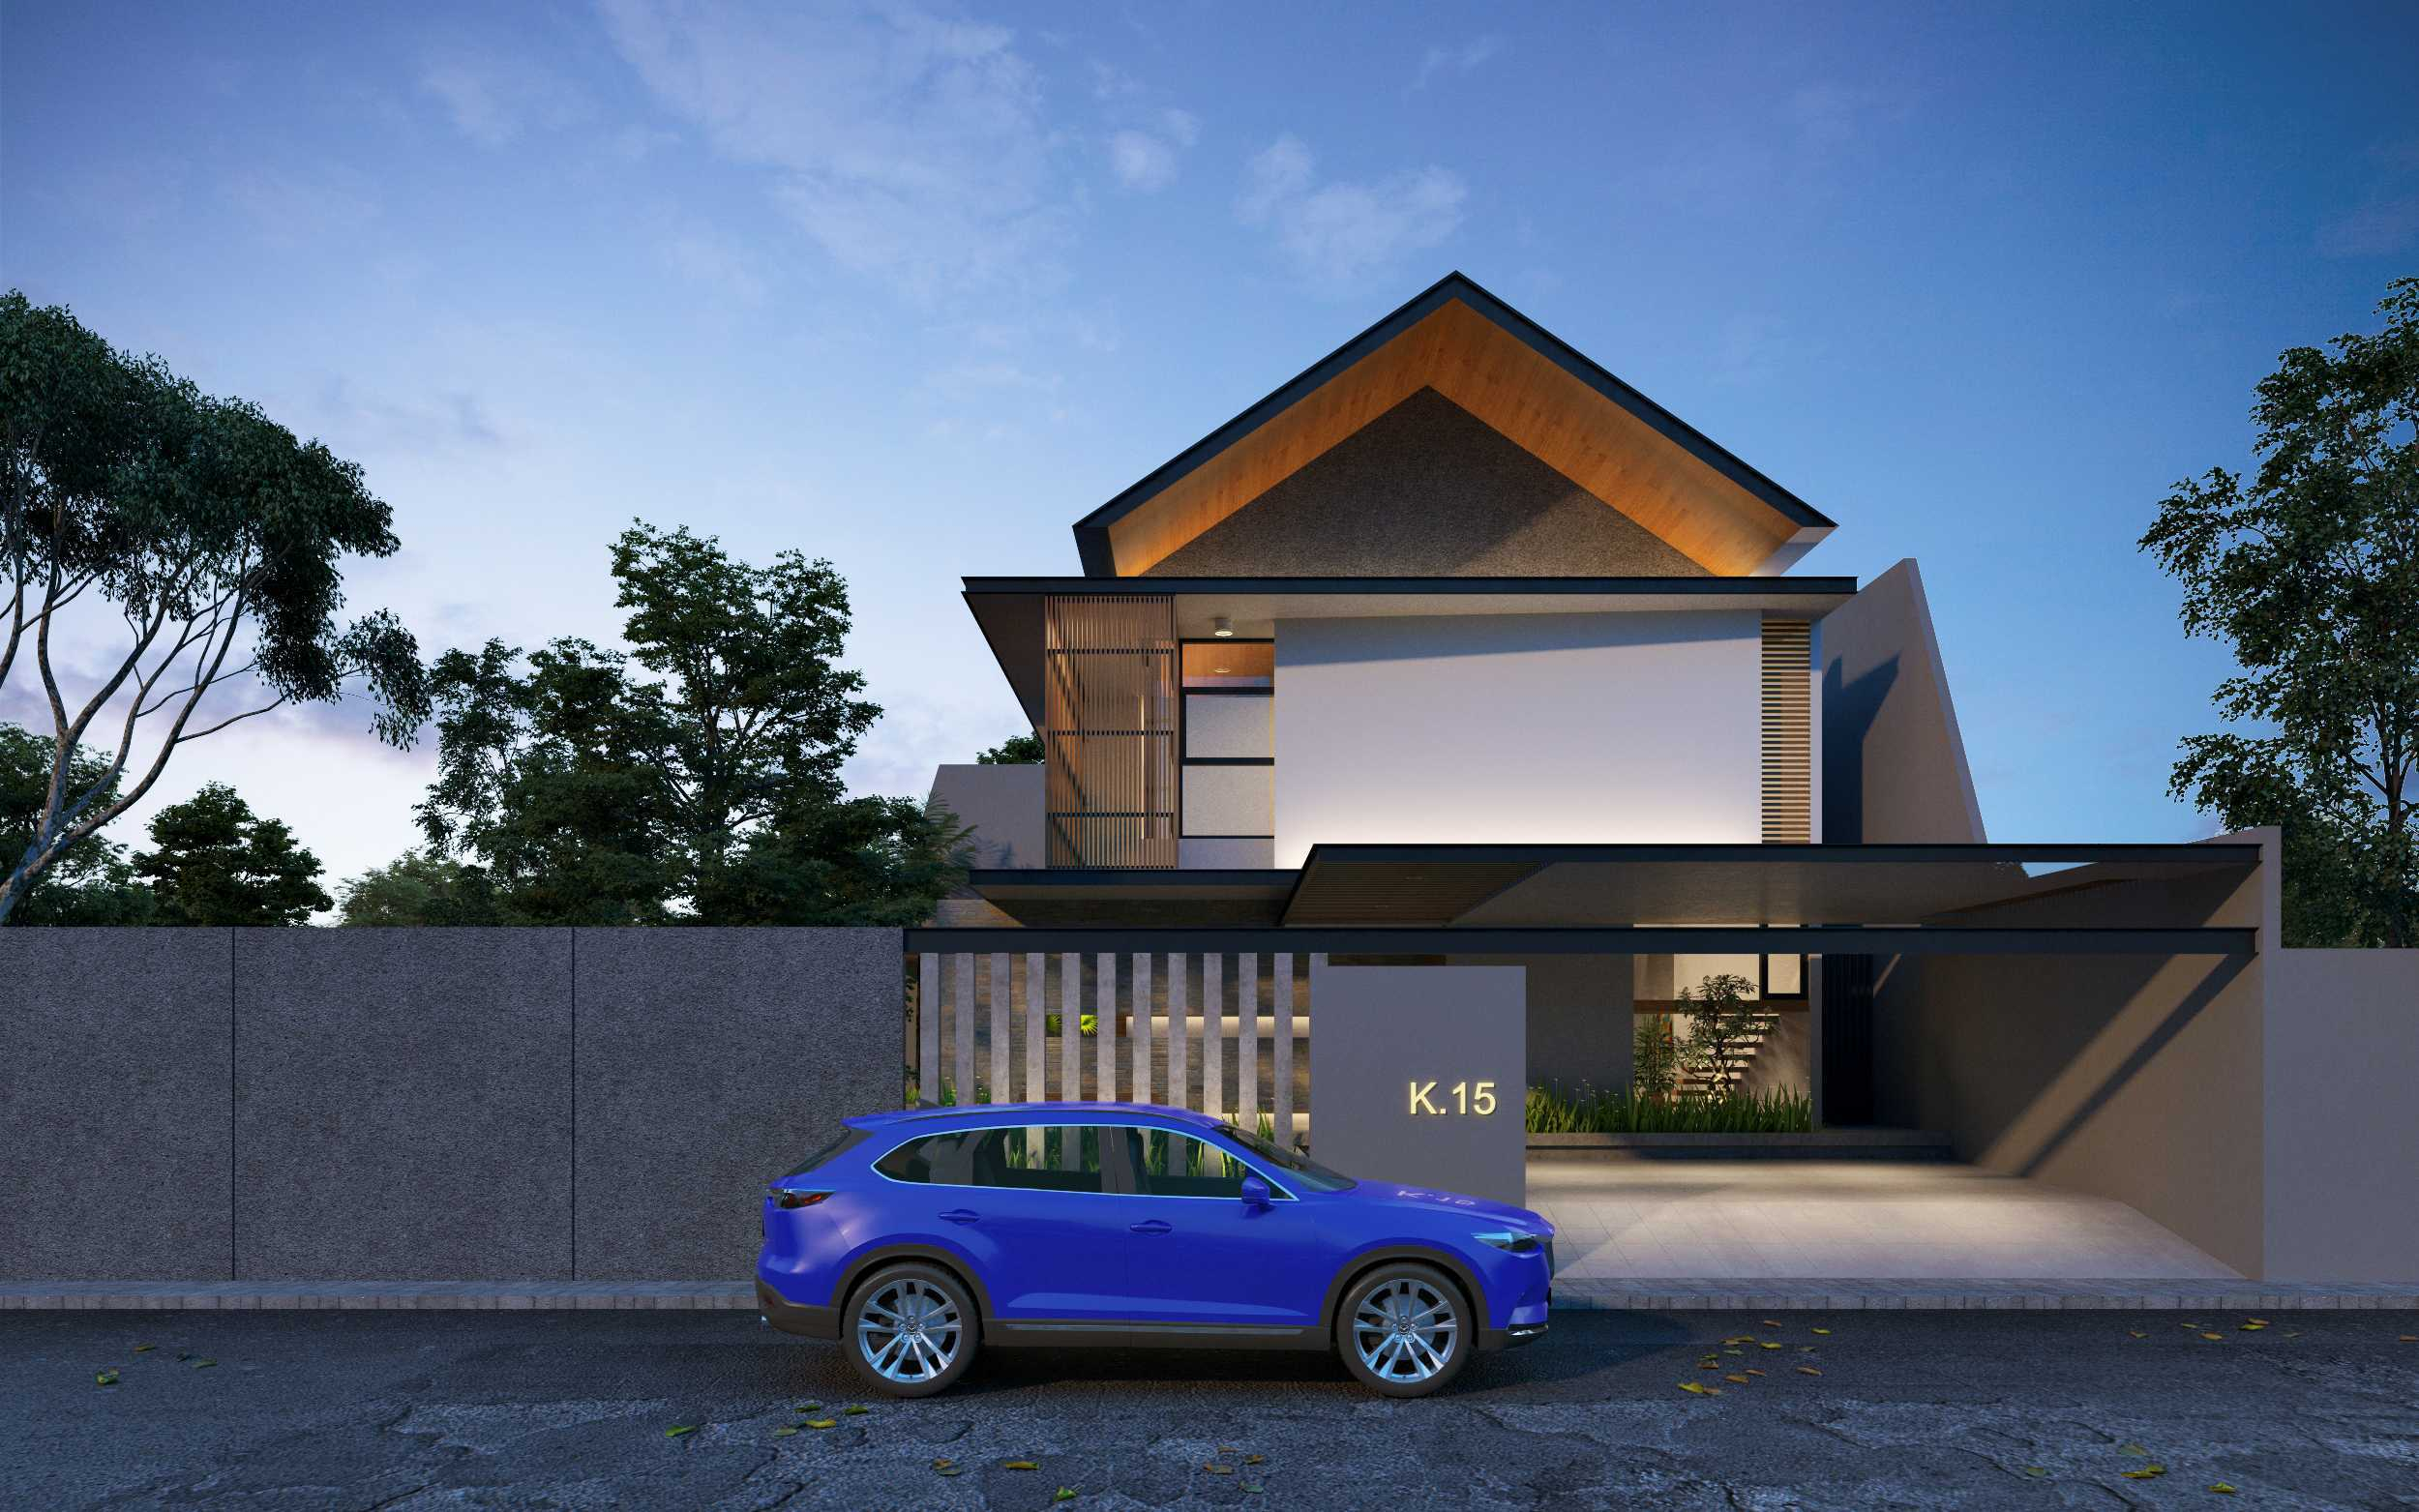 Erwin Kusuma K-15 House Ciumbuleuit, Cidadap, Kota Bandung, Jawa Barat, Indonesia Ciumbuleuit, Cidadap, Kota Bandung, Jawa Barat, Indonesia Erwin-Kusuma-K-15-House   70276